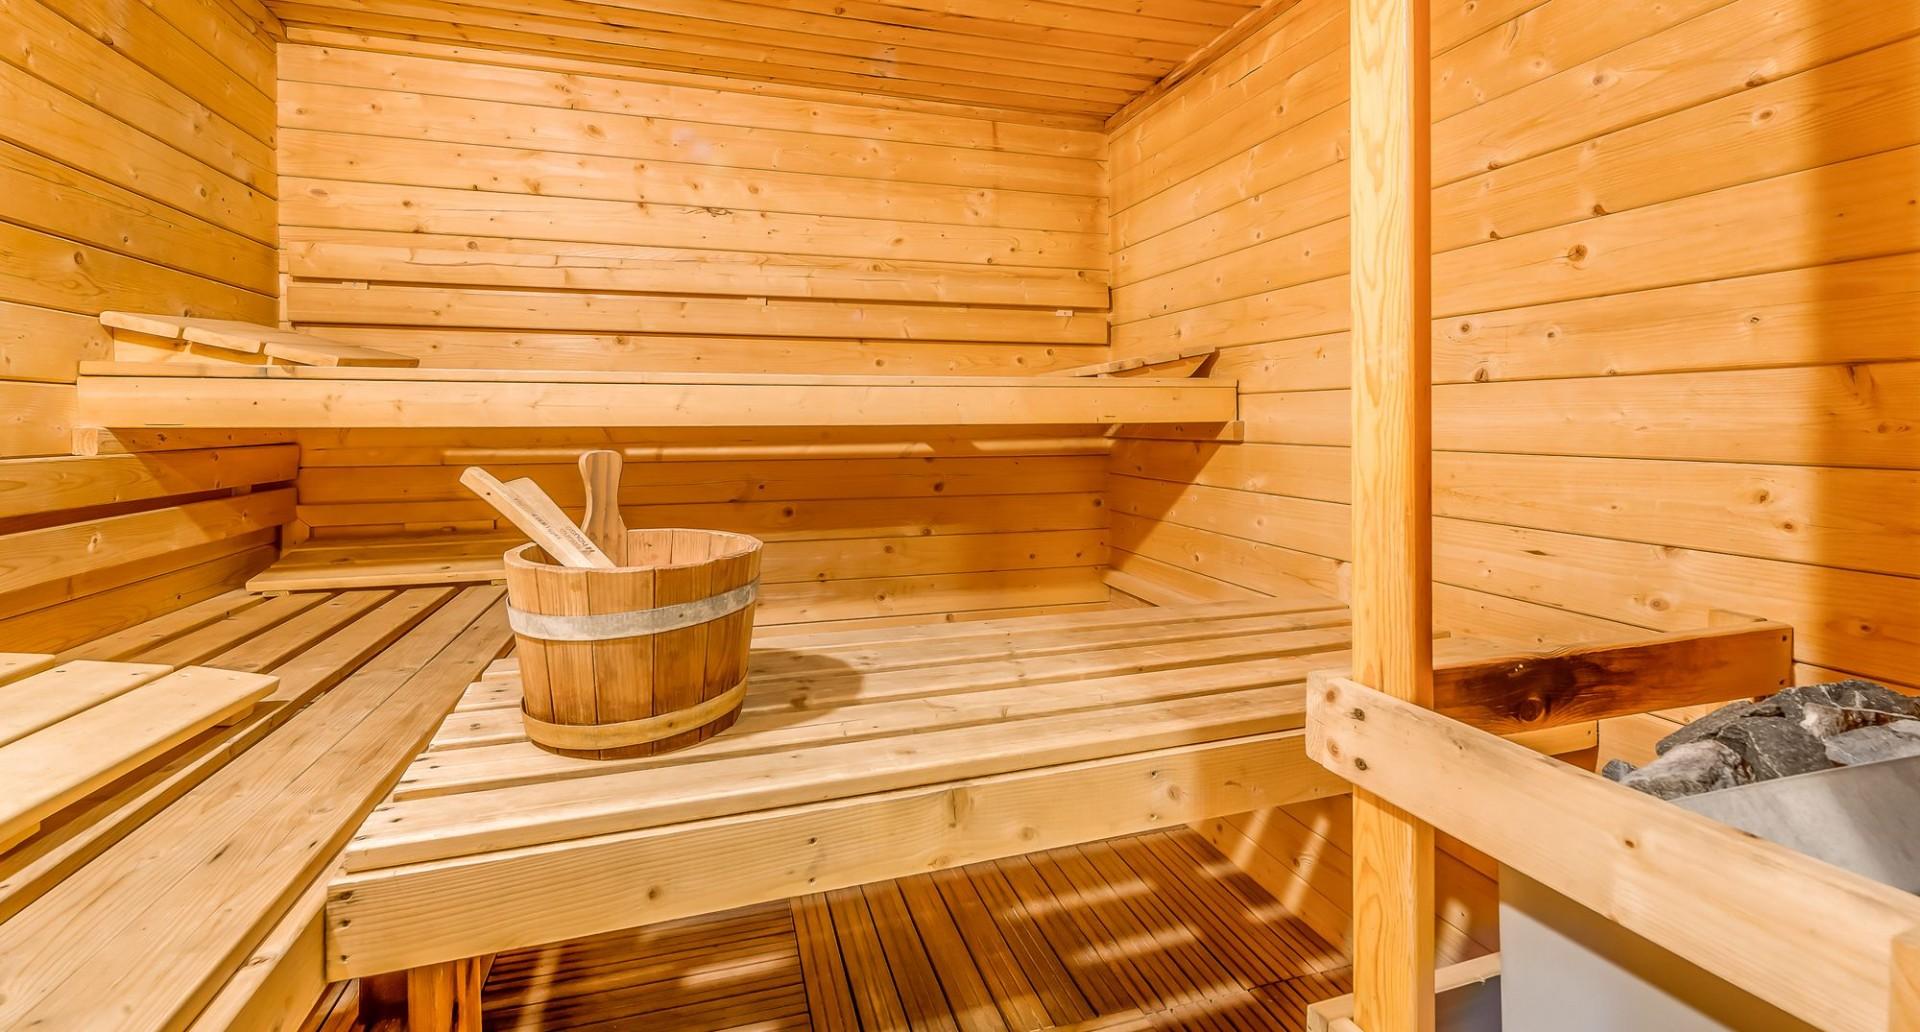 Tignes Location Chalet Luxe Agrezite Sauna